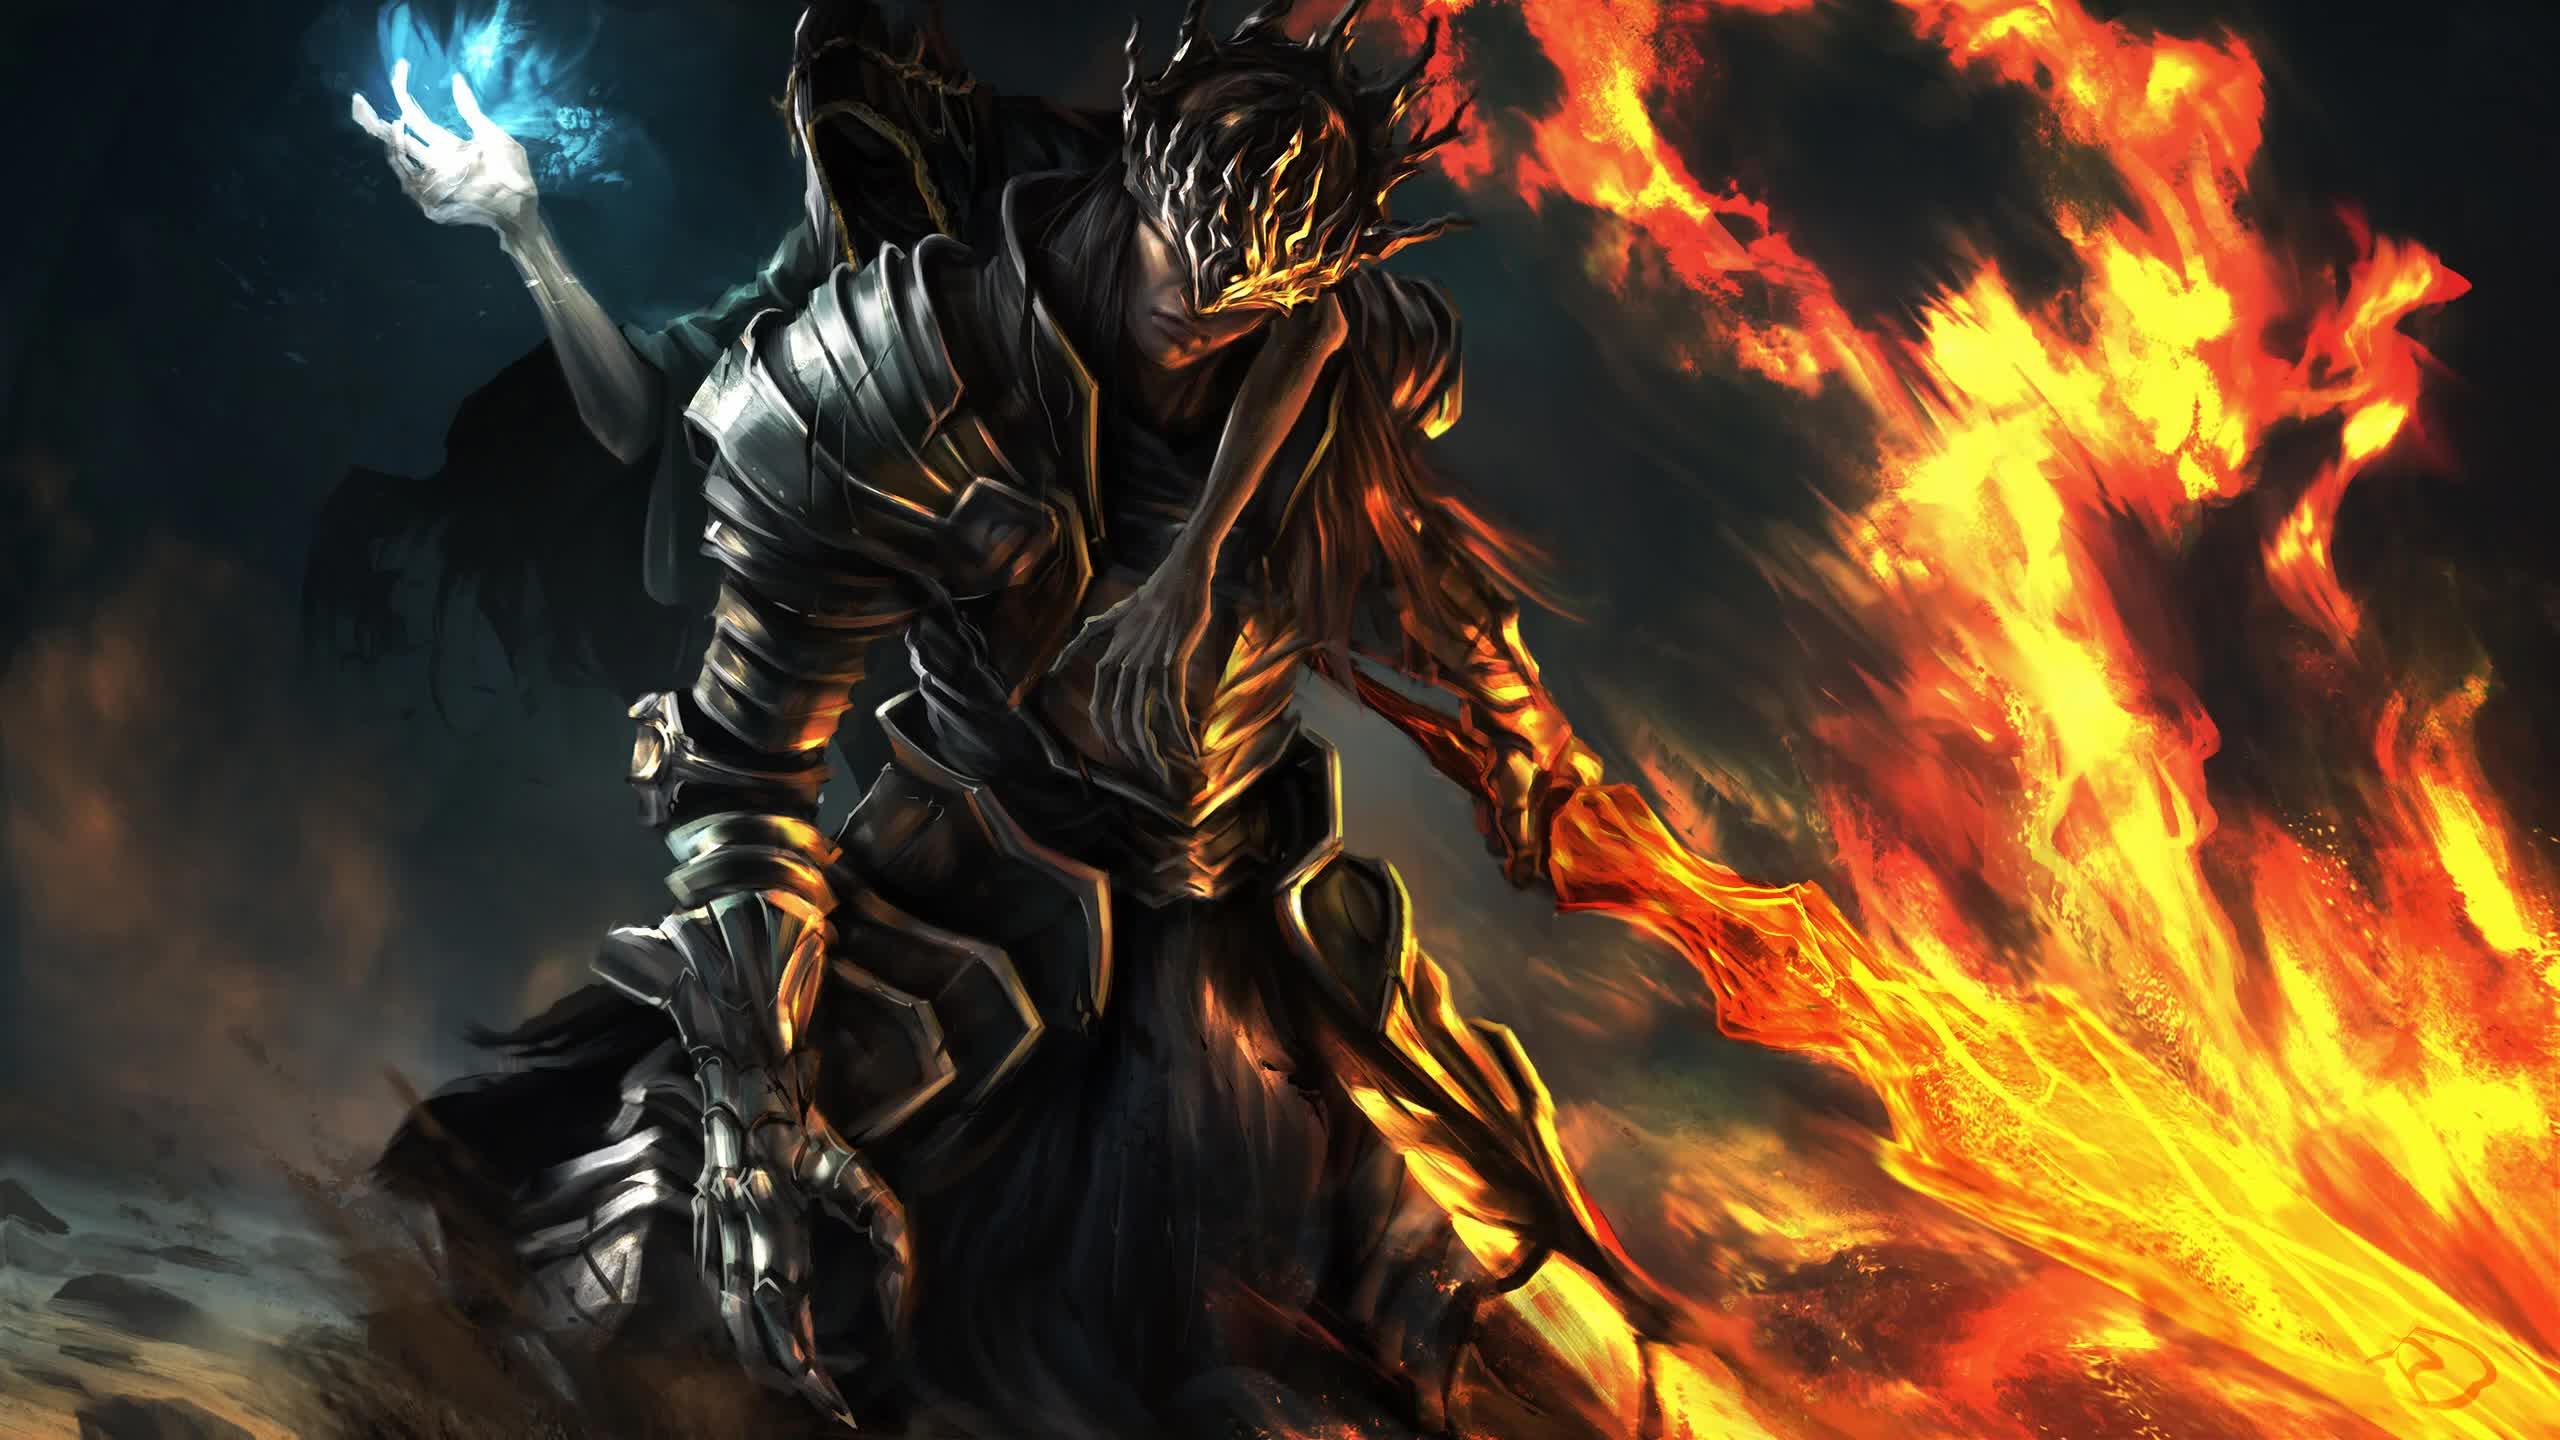 Dark Souls III Artwork 2K - Free Animated Wallpaper - Live ...